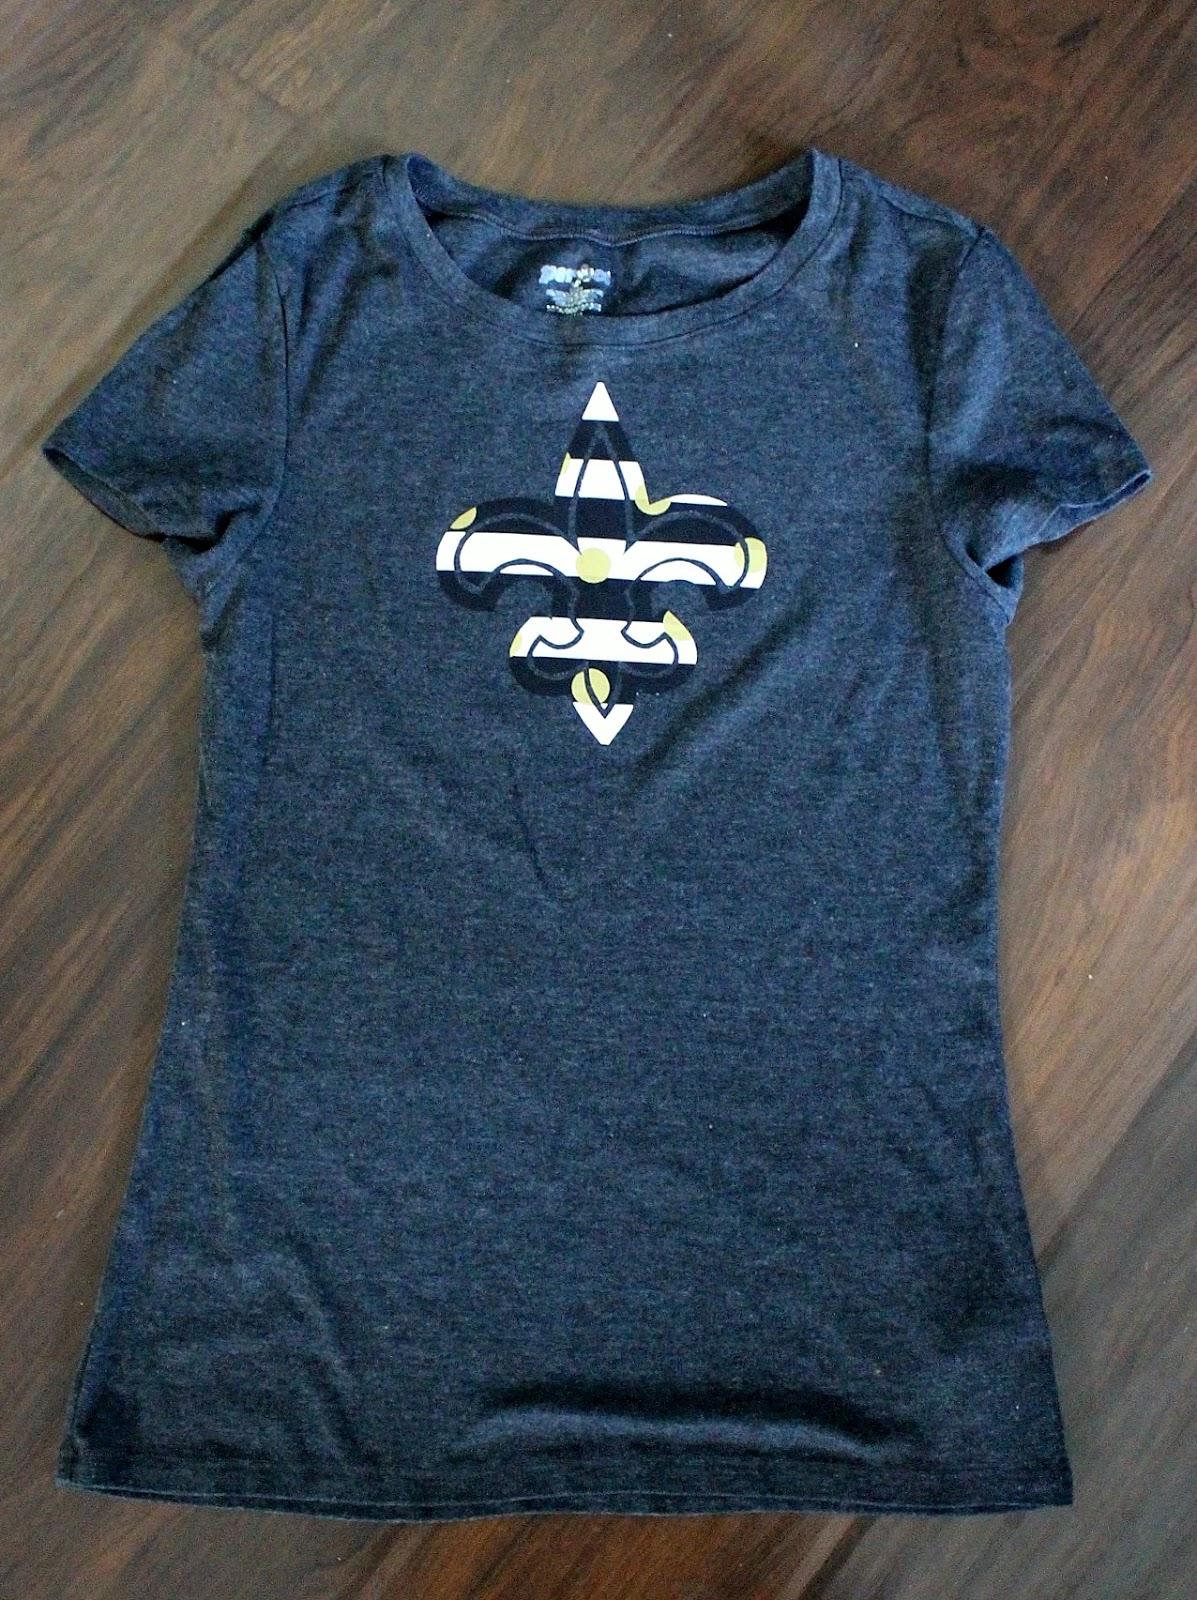 Nadia's DIY Projects: 3 DIY New Orleans Saints T-Shirt Designs